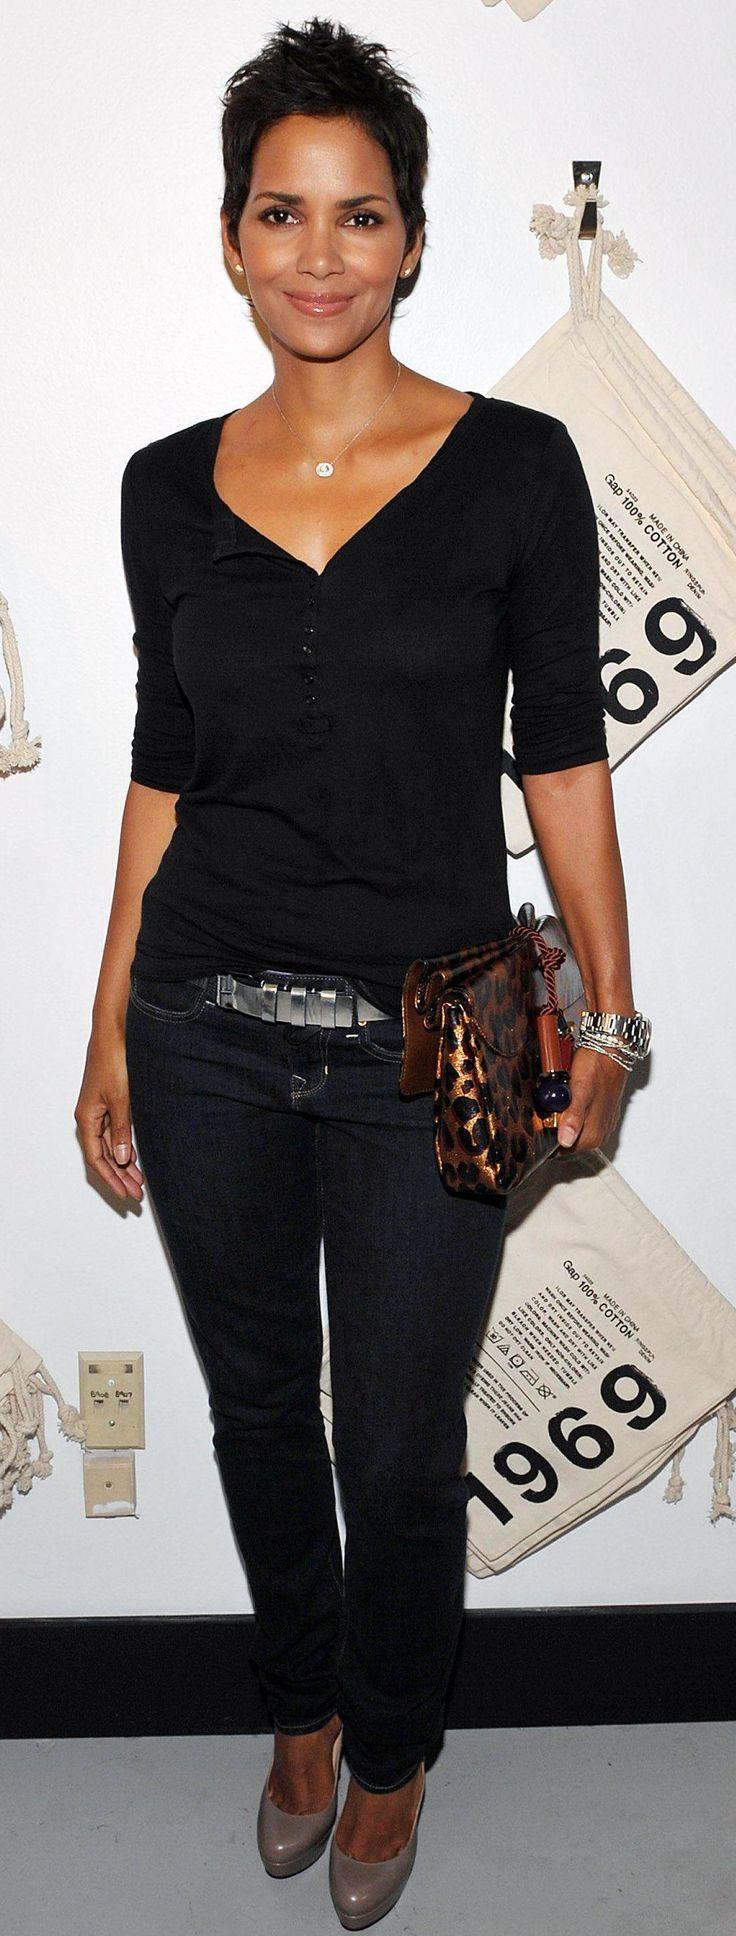 Halle Berry 1.66m                                                                                                                                                                                 Más